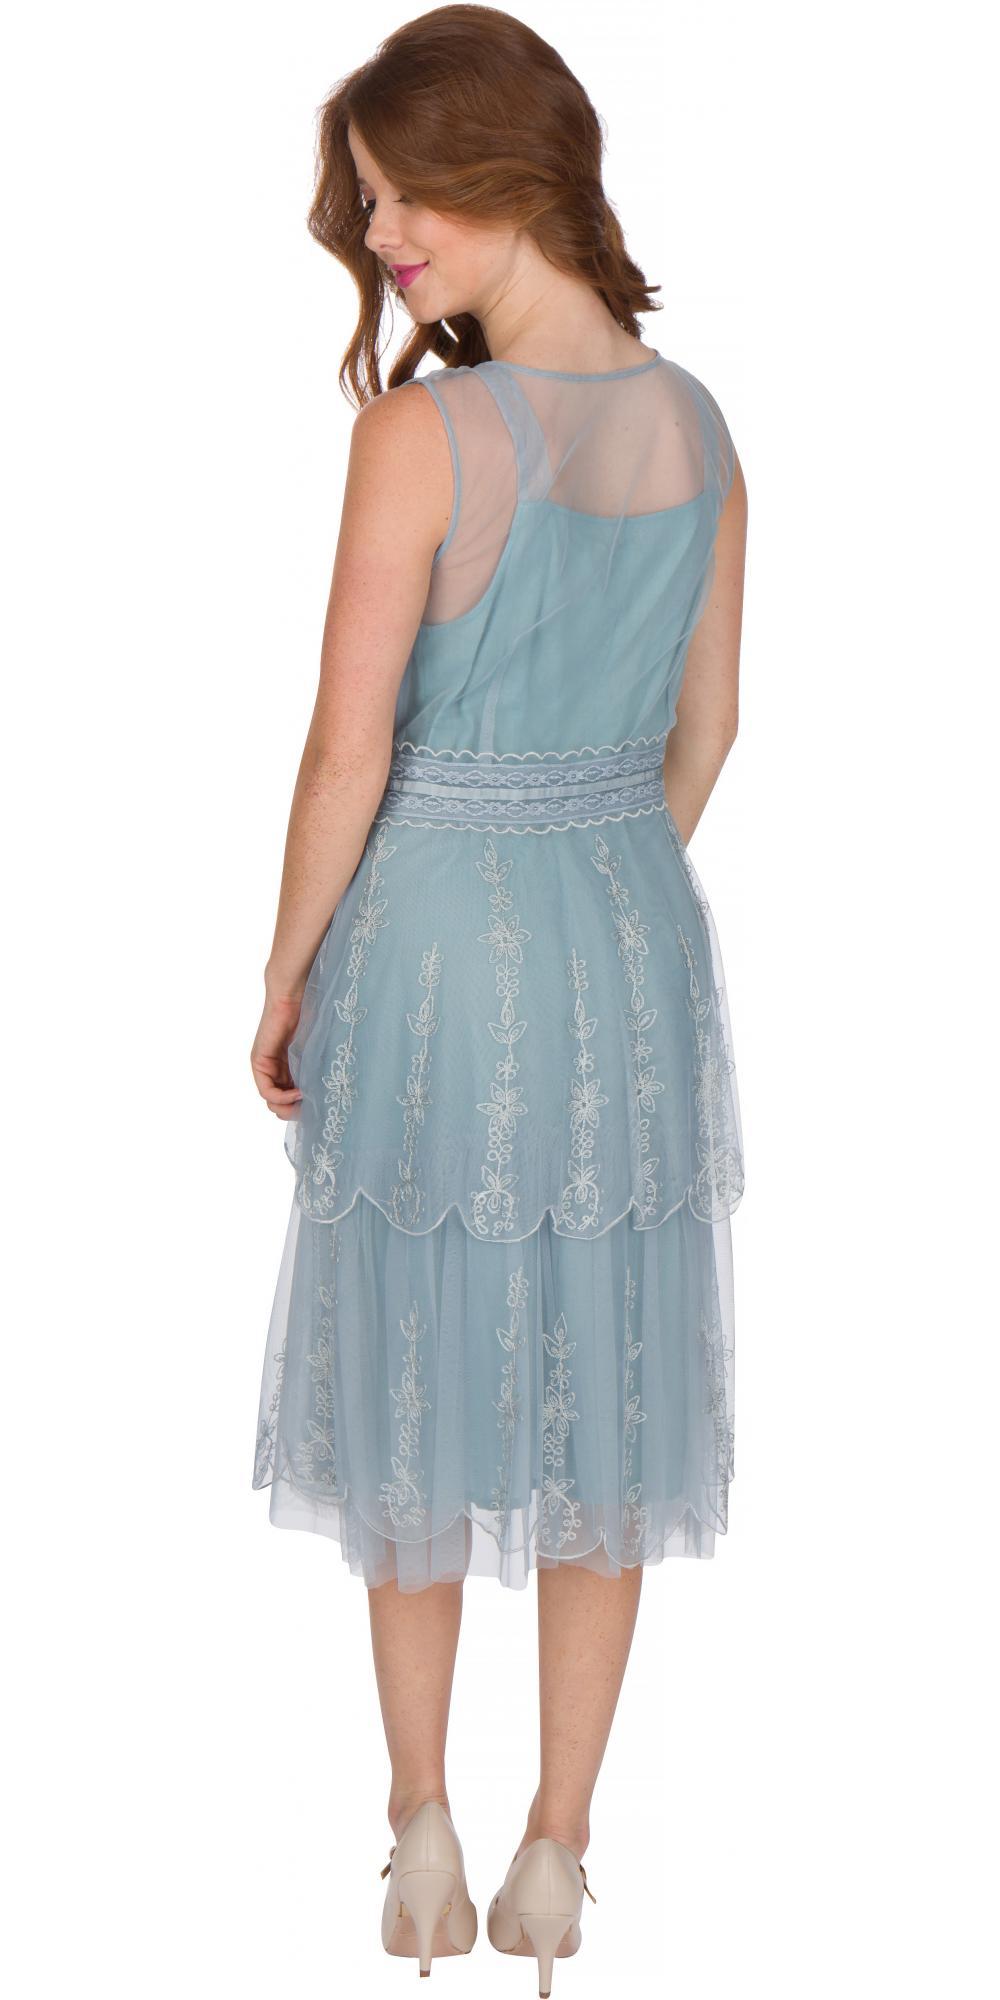 Age of Love Nataya AL-235 Party Dress in Sunrise